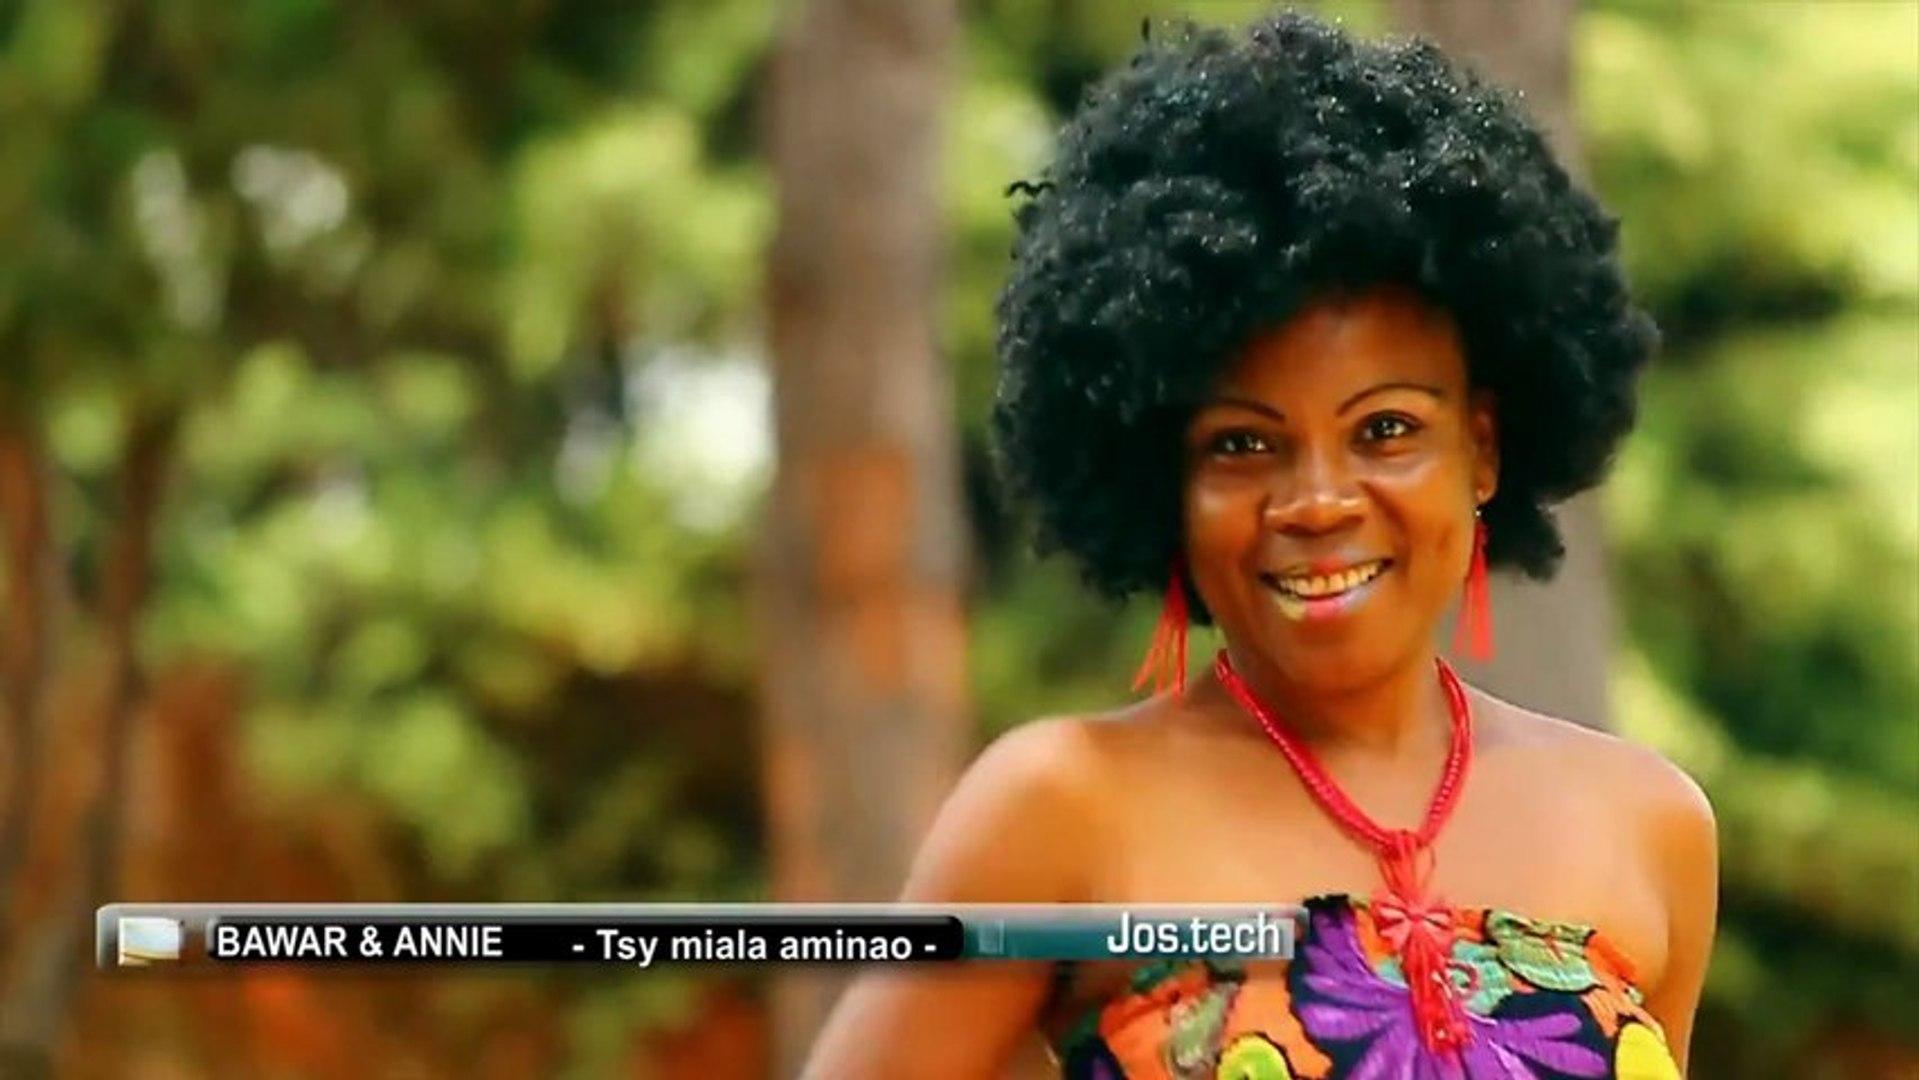 BAWAR & ANNIE    -    Tsy miala aminao  (gasy - malagasy)